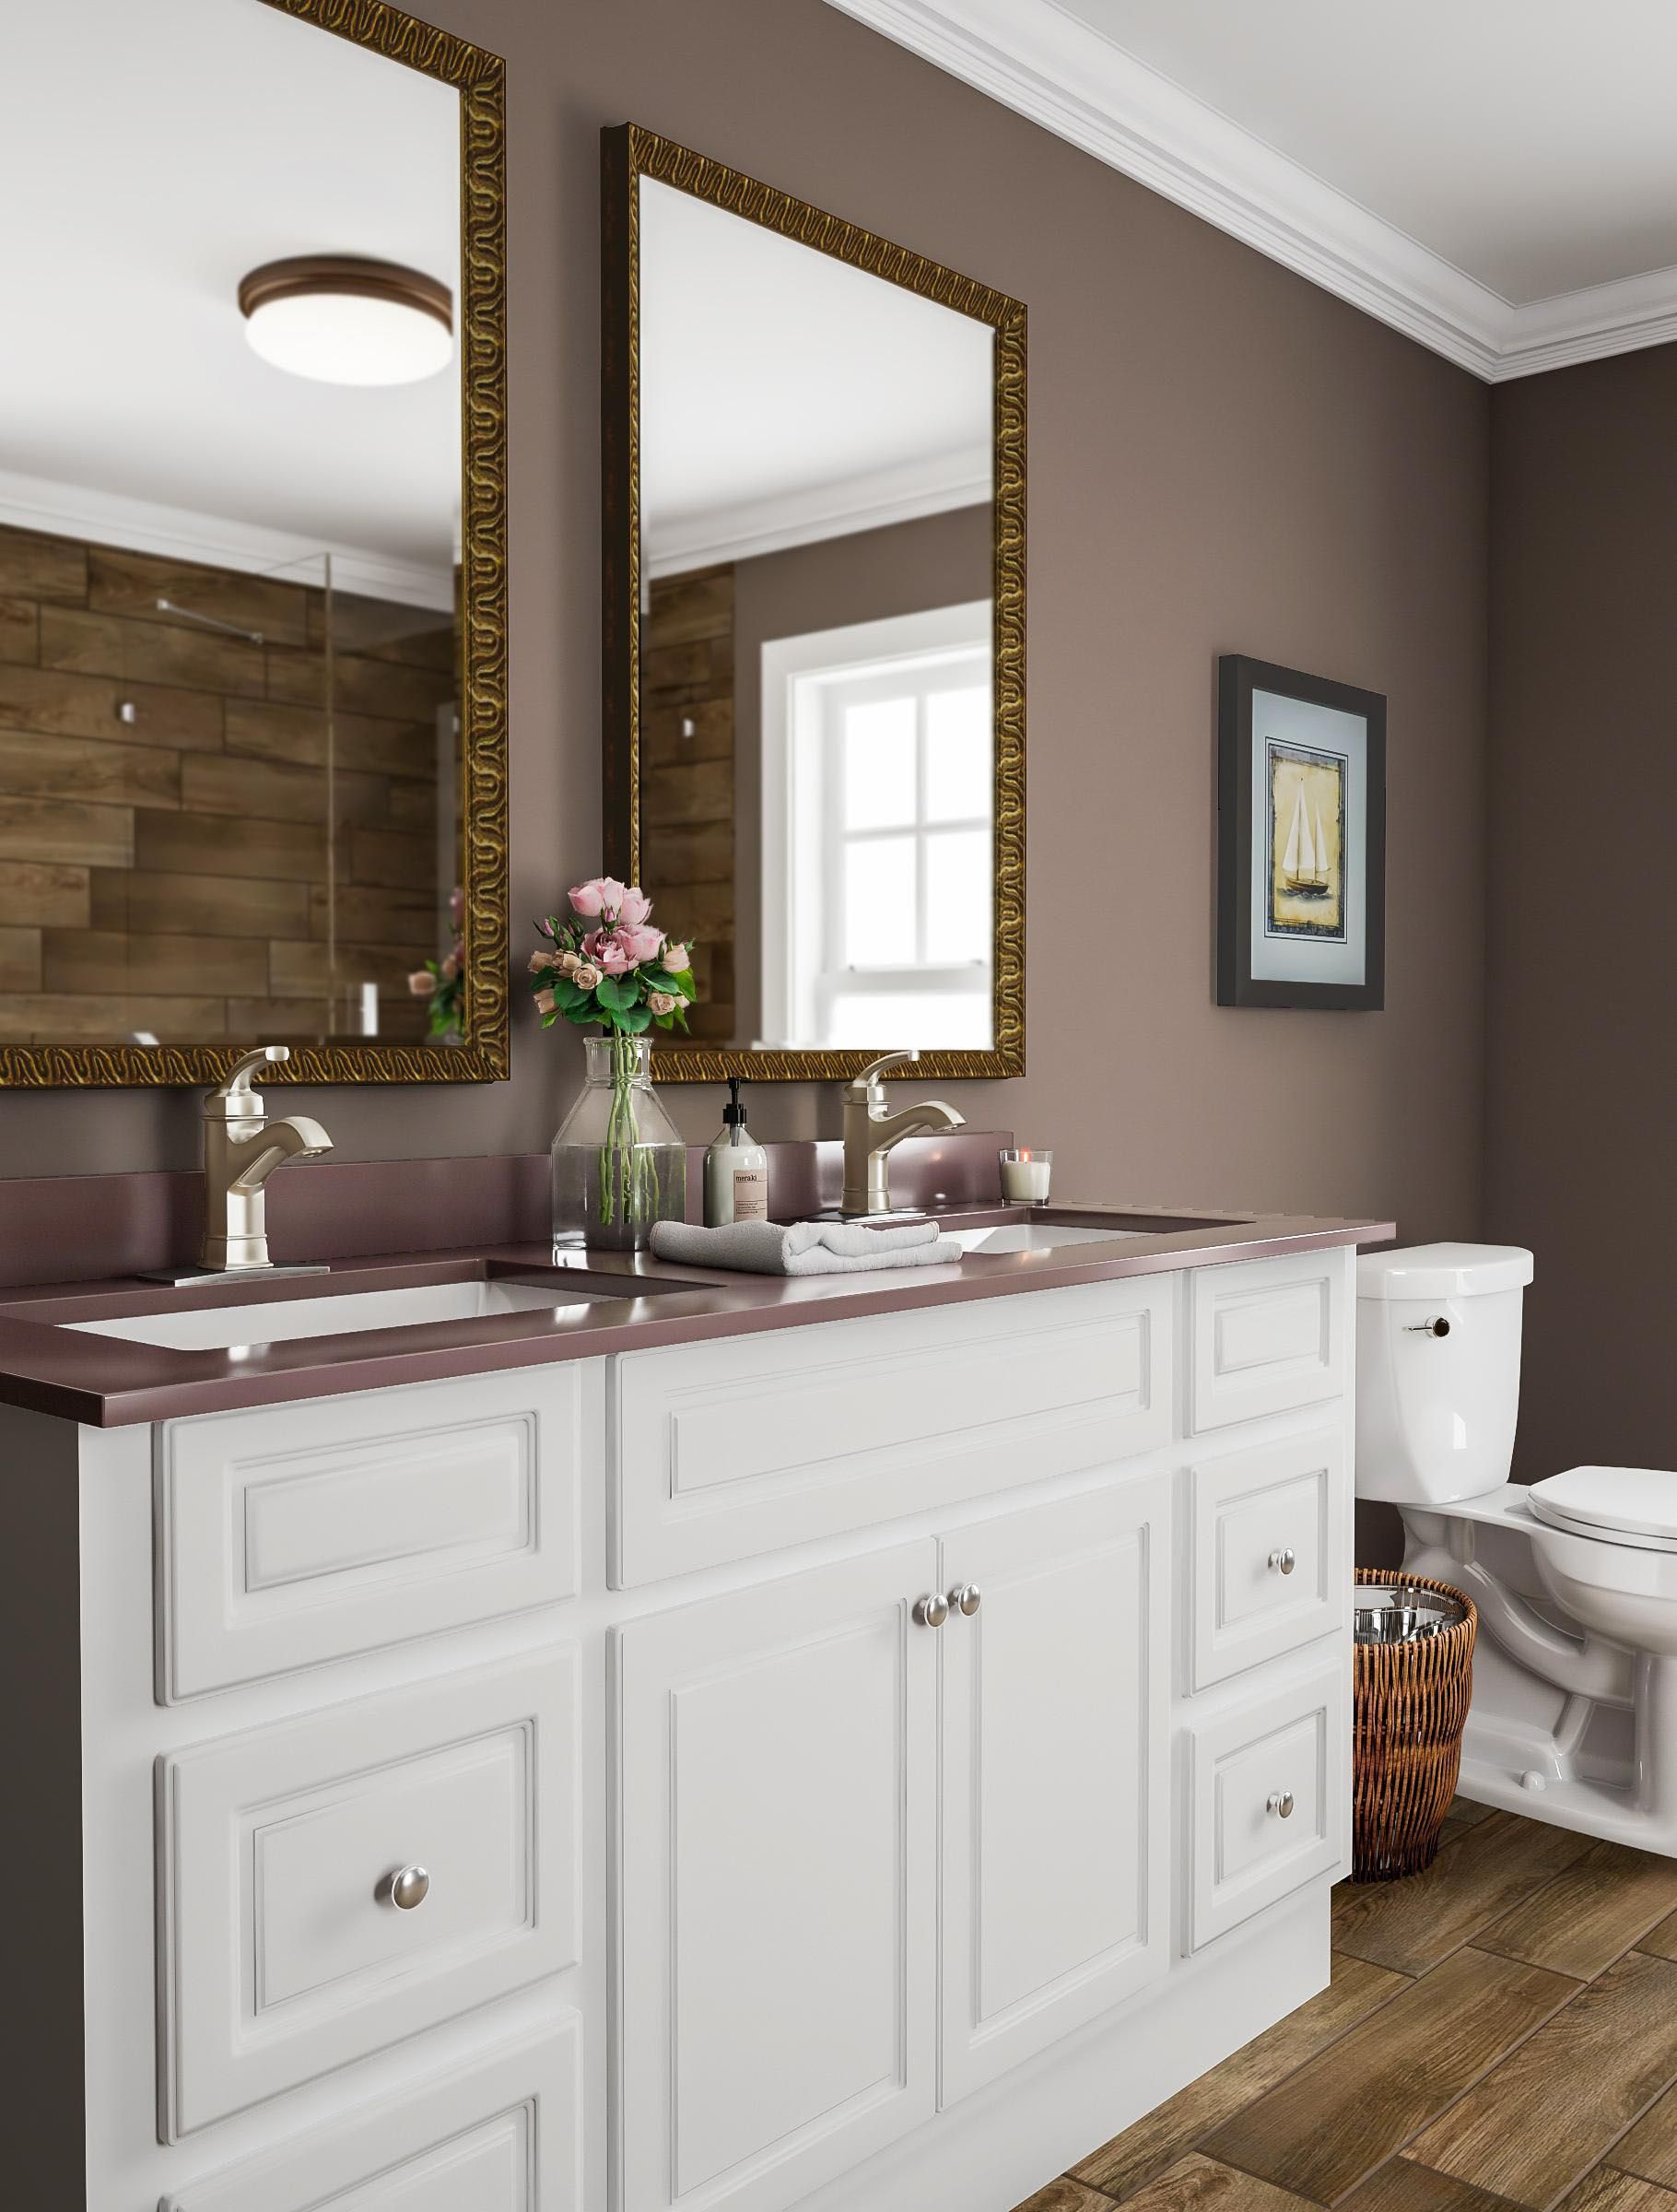 Bathroom Color Schemes Brown Bathroom Paint Bathroom Color Schemes Bathroom Paint Colors